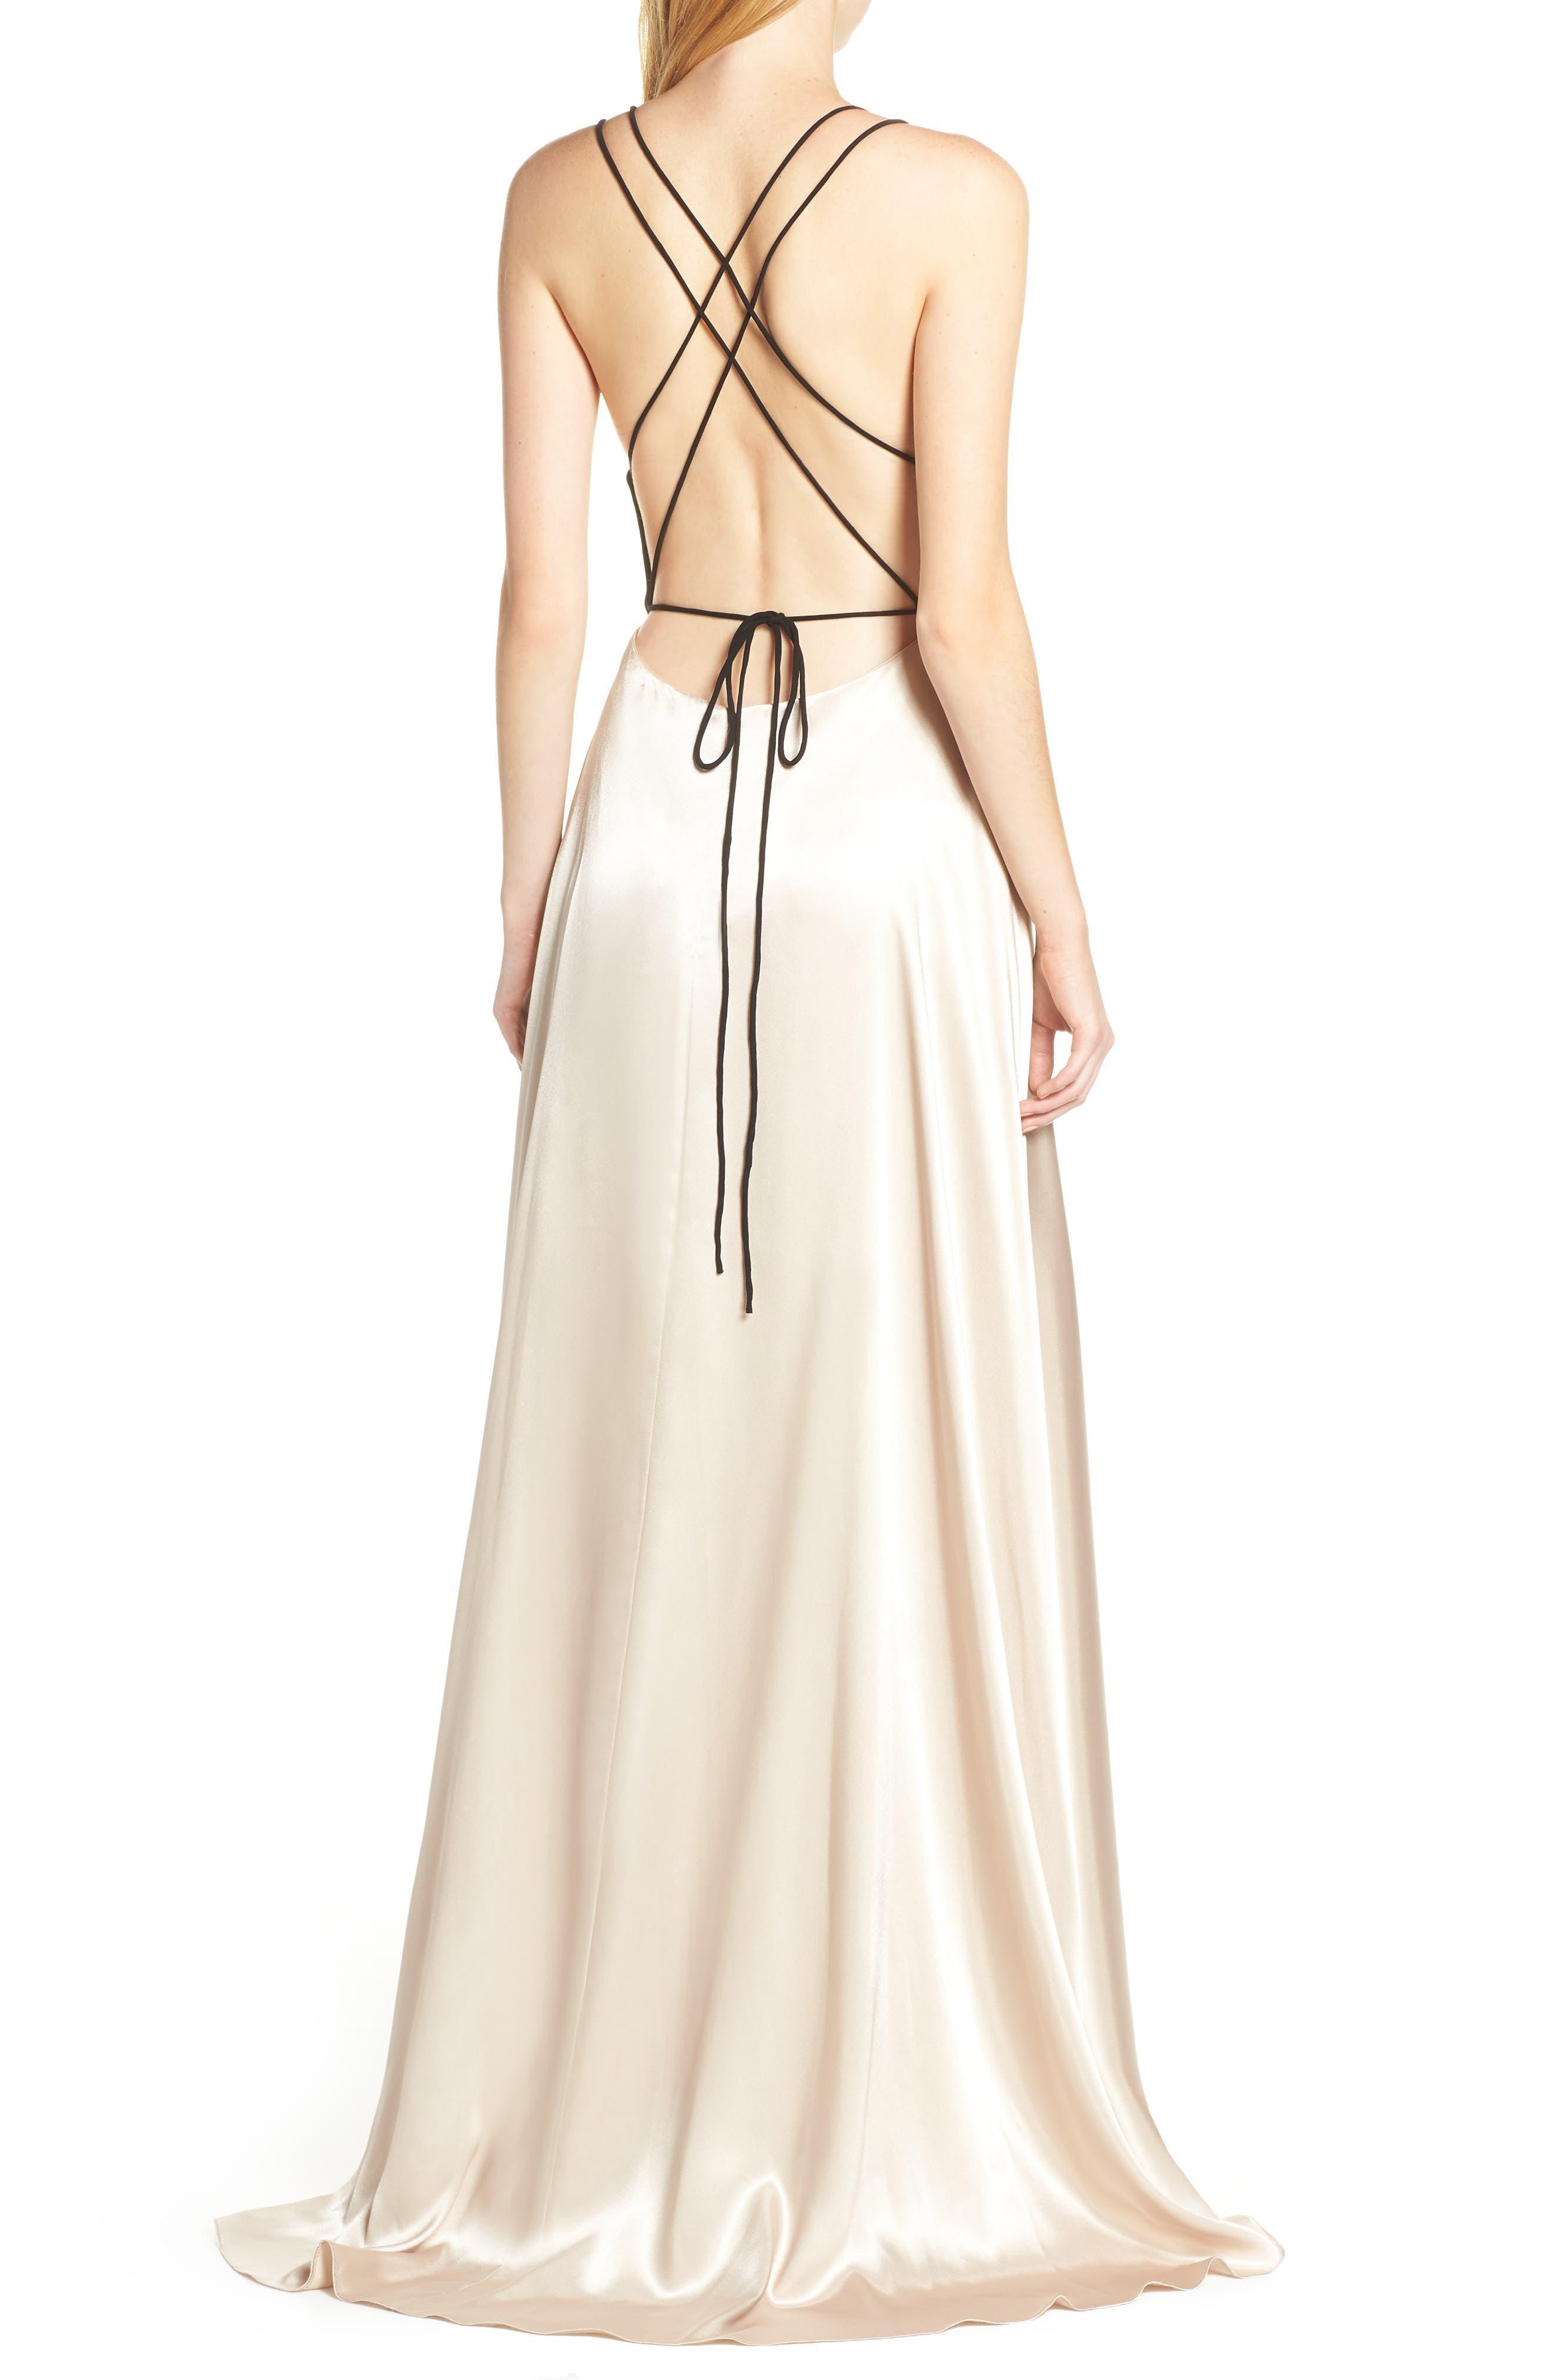 BLONDIE NITES, Strappy Back Crepe & Charmeuse Evening Dress, Alternate thumbnail 2, color, BLACK/ GOLD